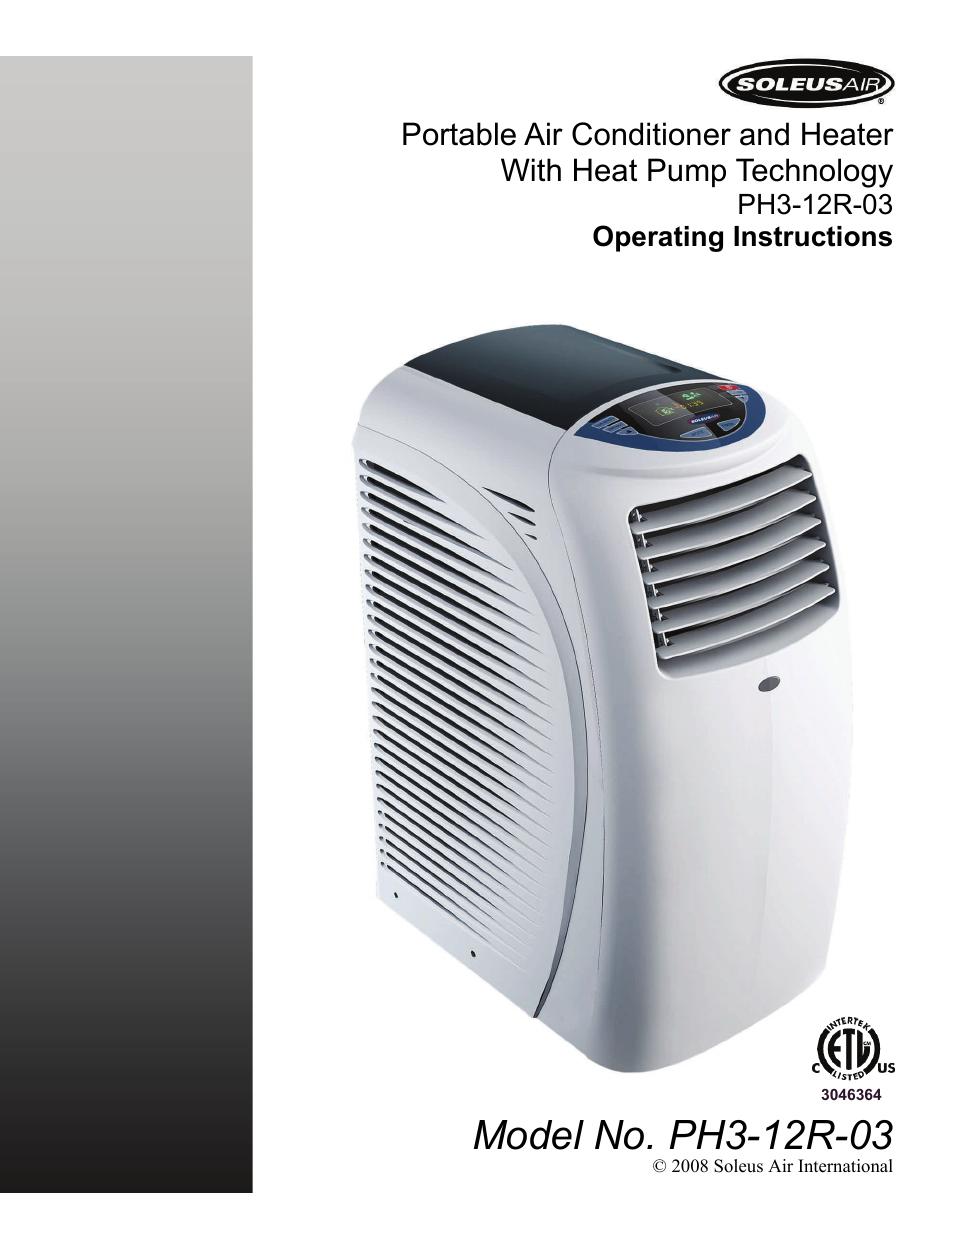 Soleus Air Heater Wiring Diagram Modern Design Of International Heat Pump Ph3 12r 03 User Manual 16 Pages Rh Manualsdir Com Portable Conditioner With